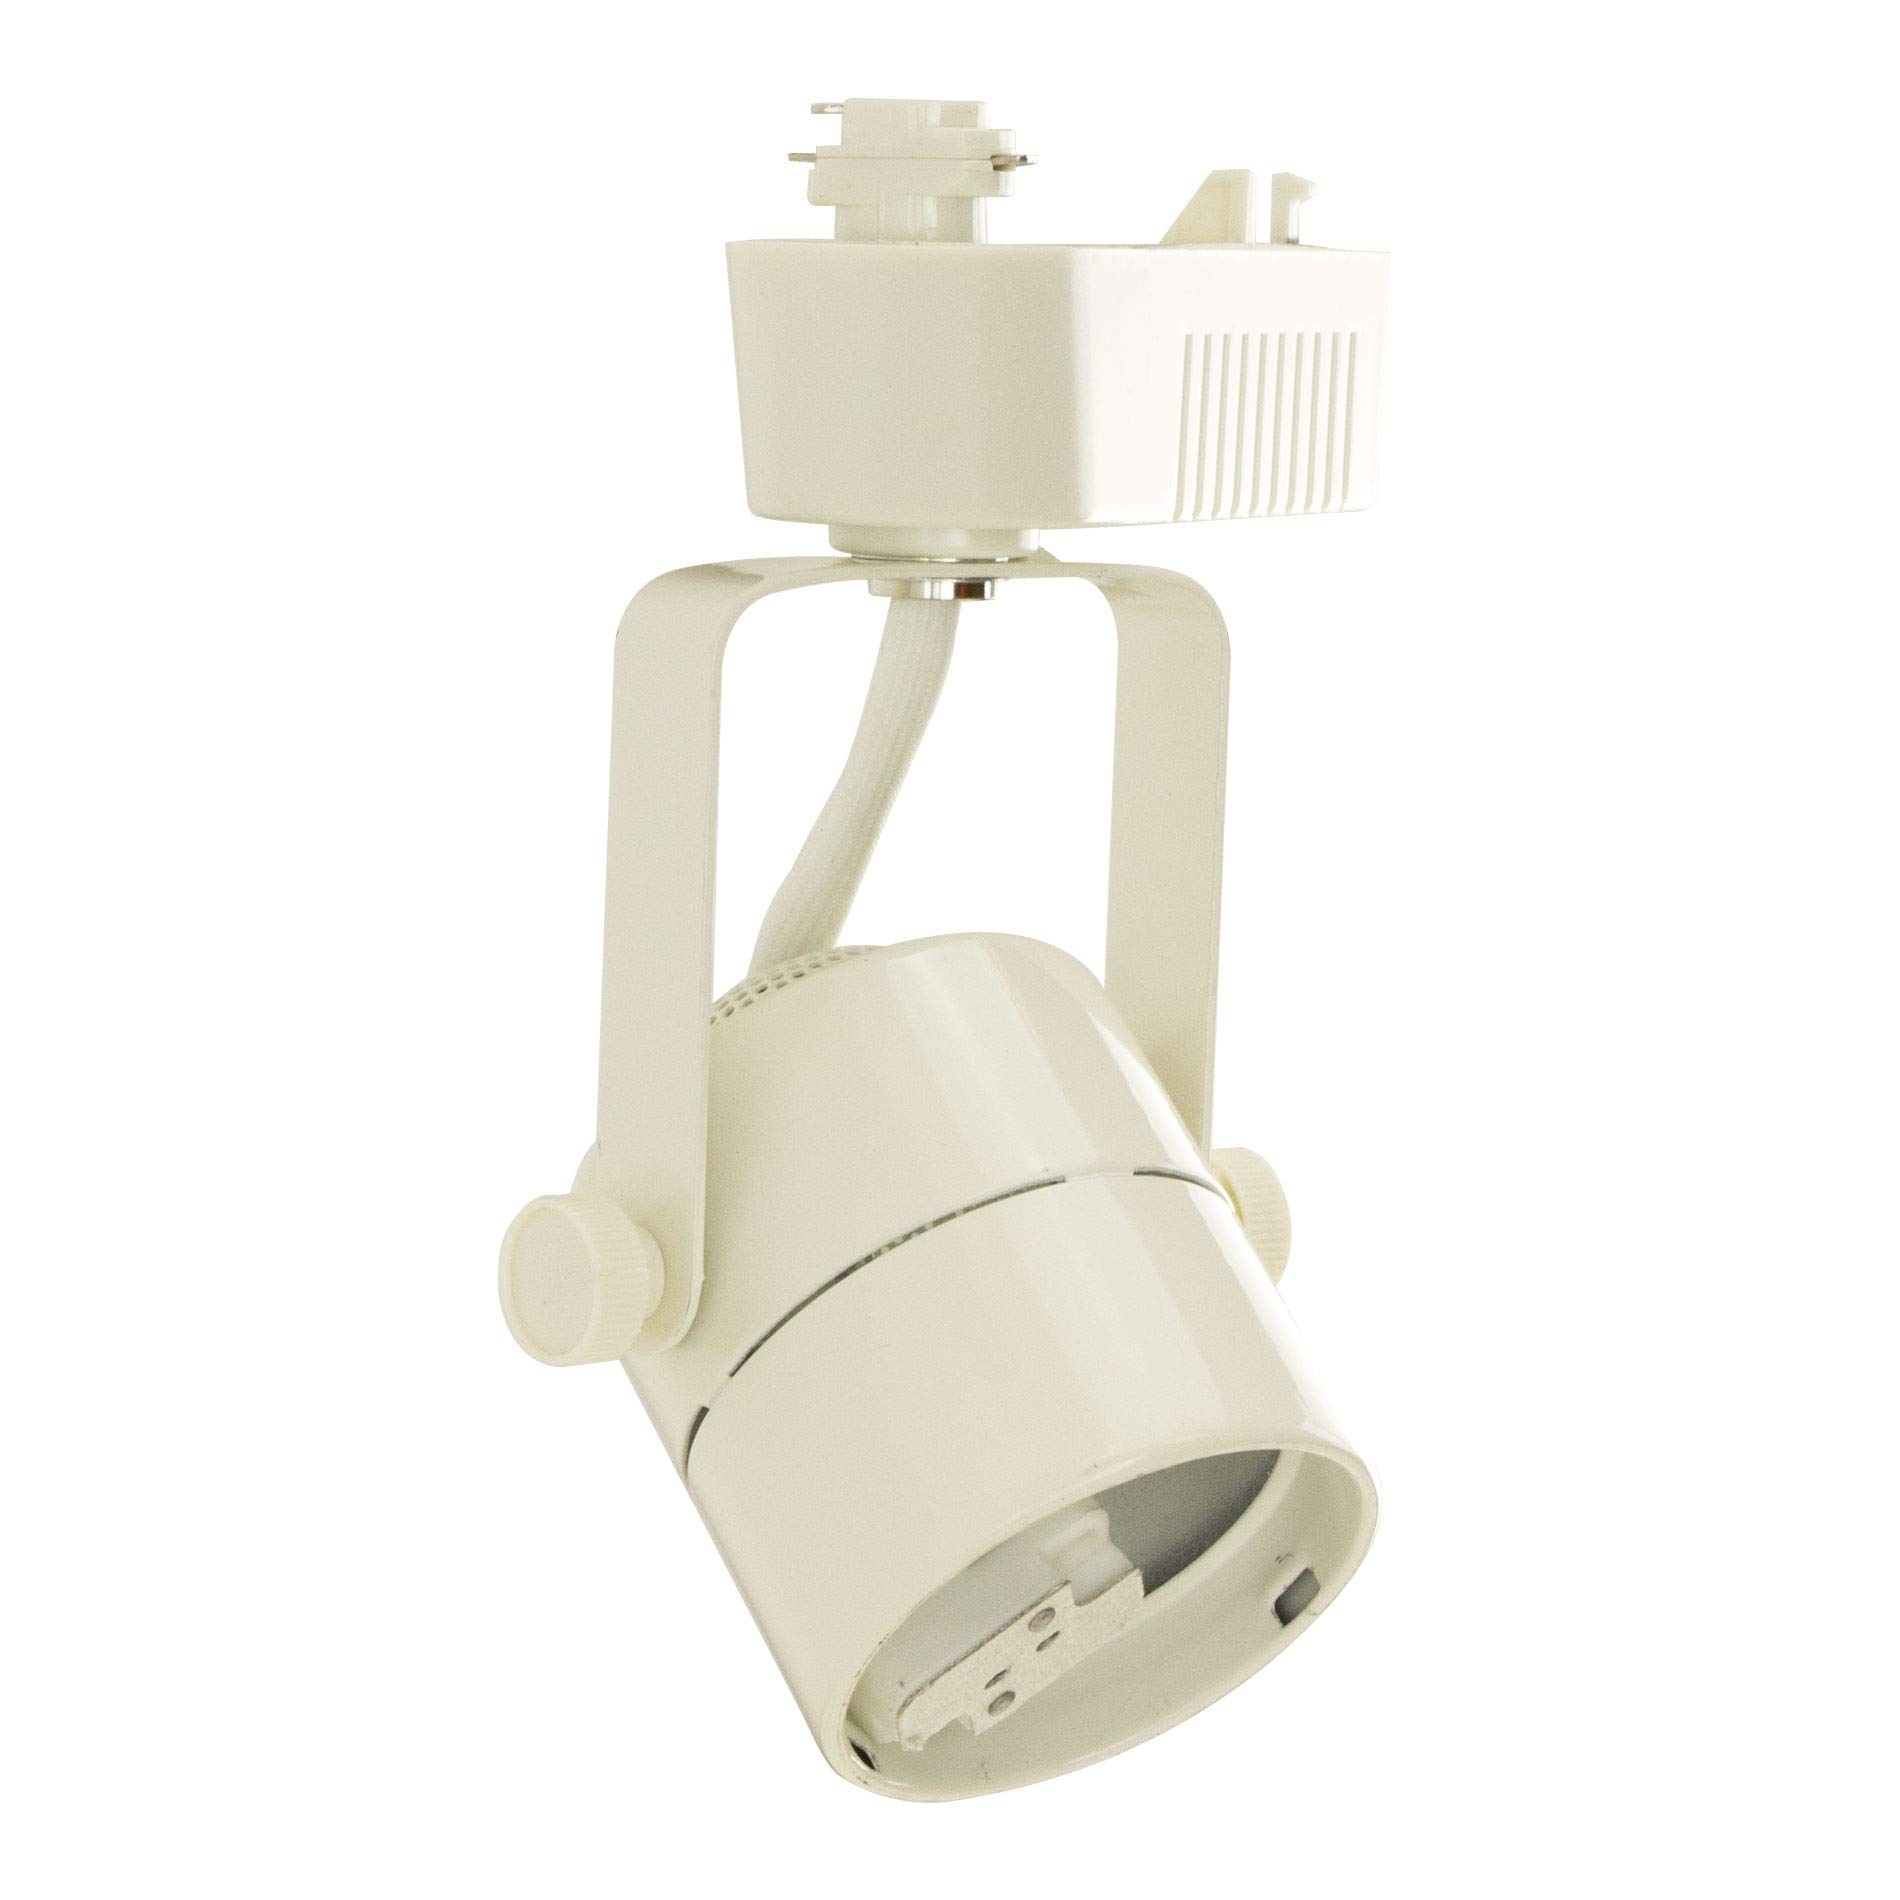 Direct-Lighting 50010 White MR16 Cylinder Low Voltage Track Lighting Head